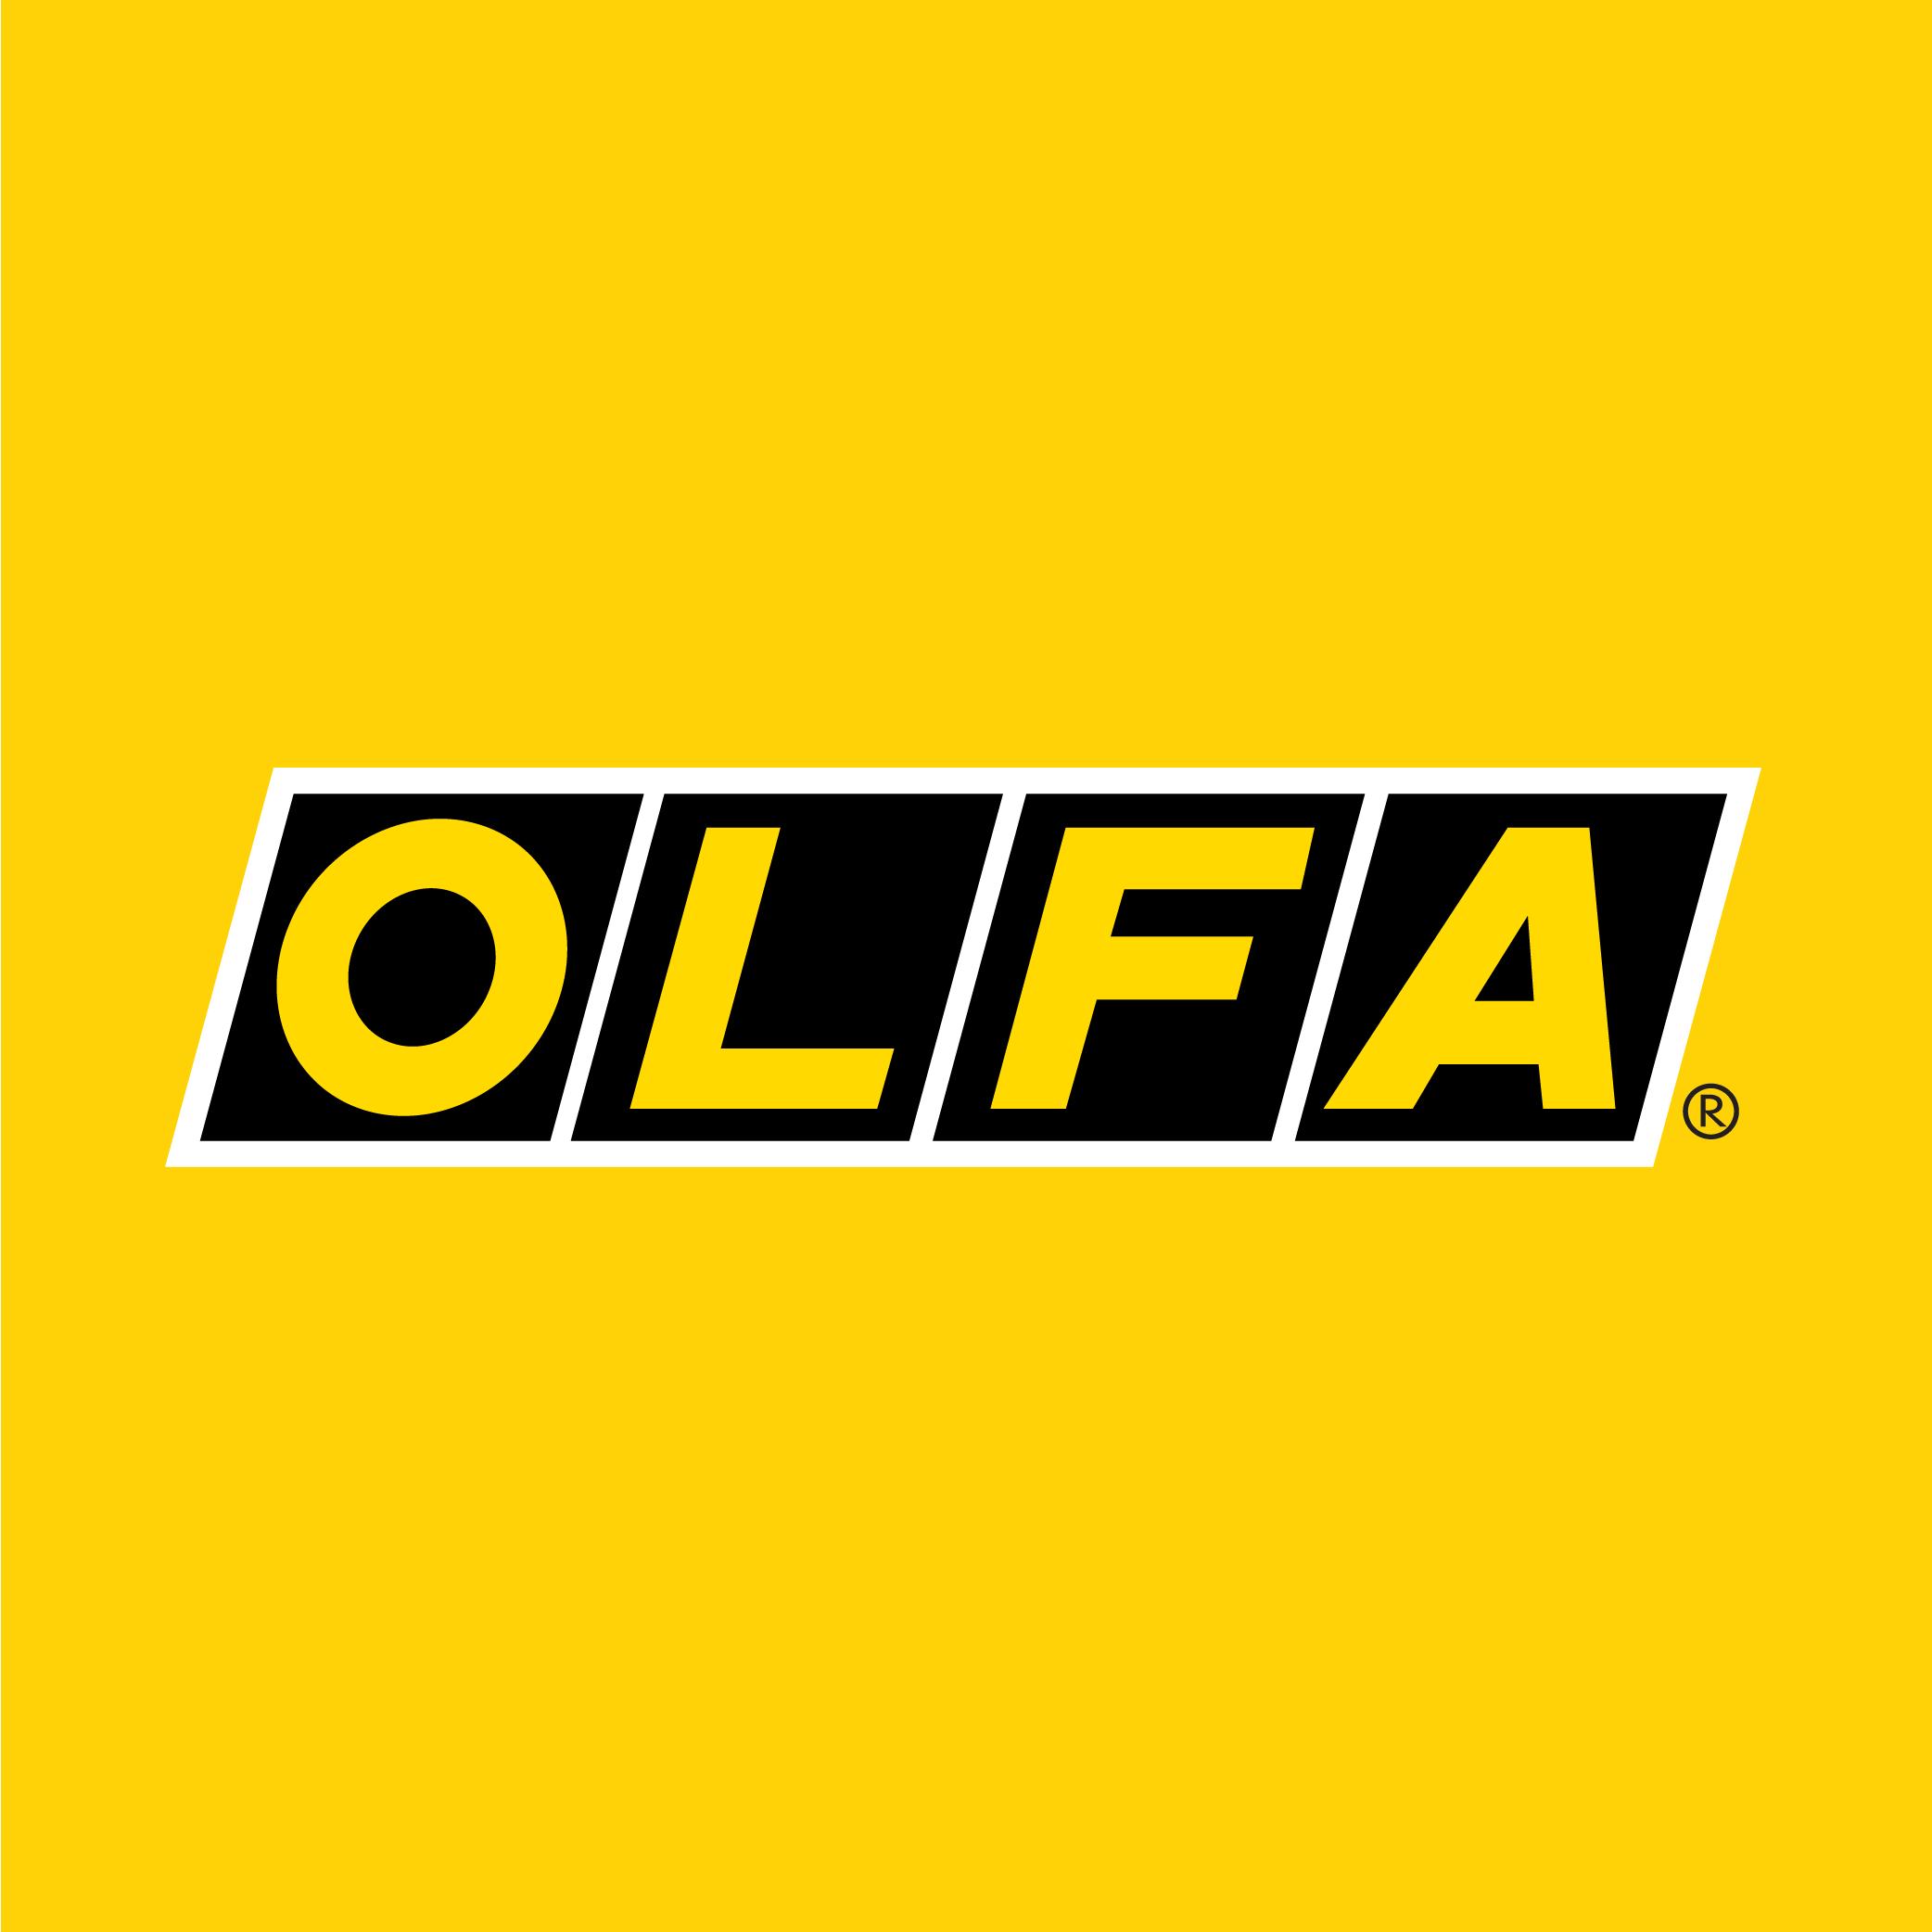 S&S Home Supplies Ltd (OLFA UK)